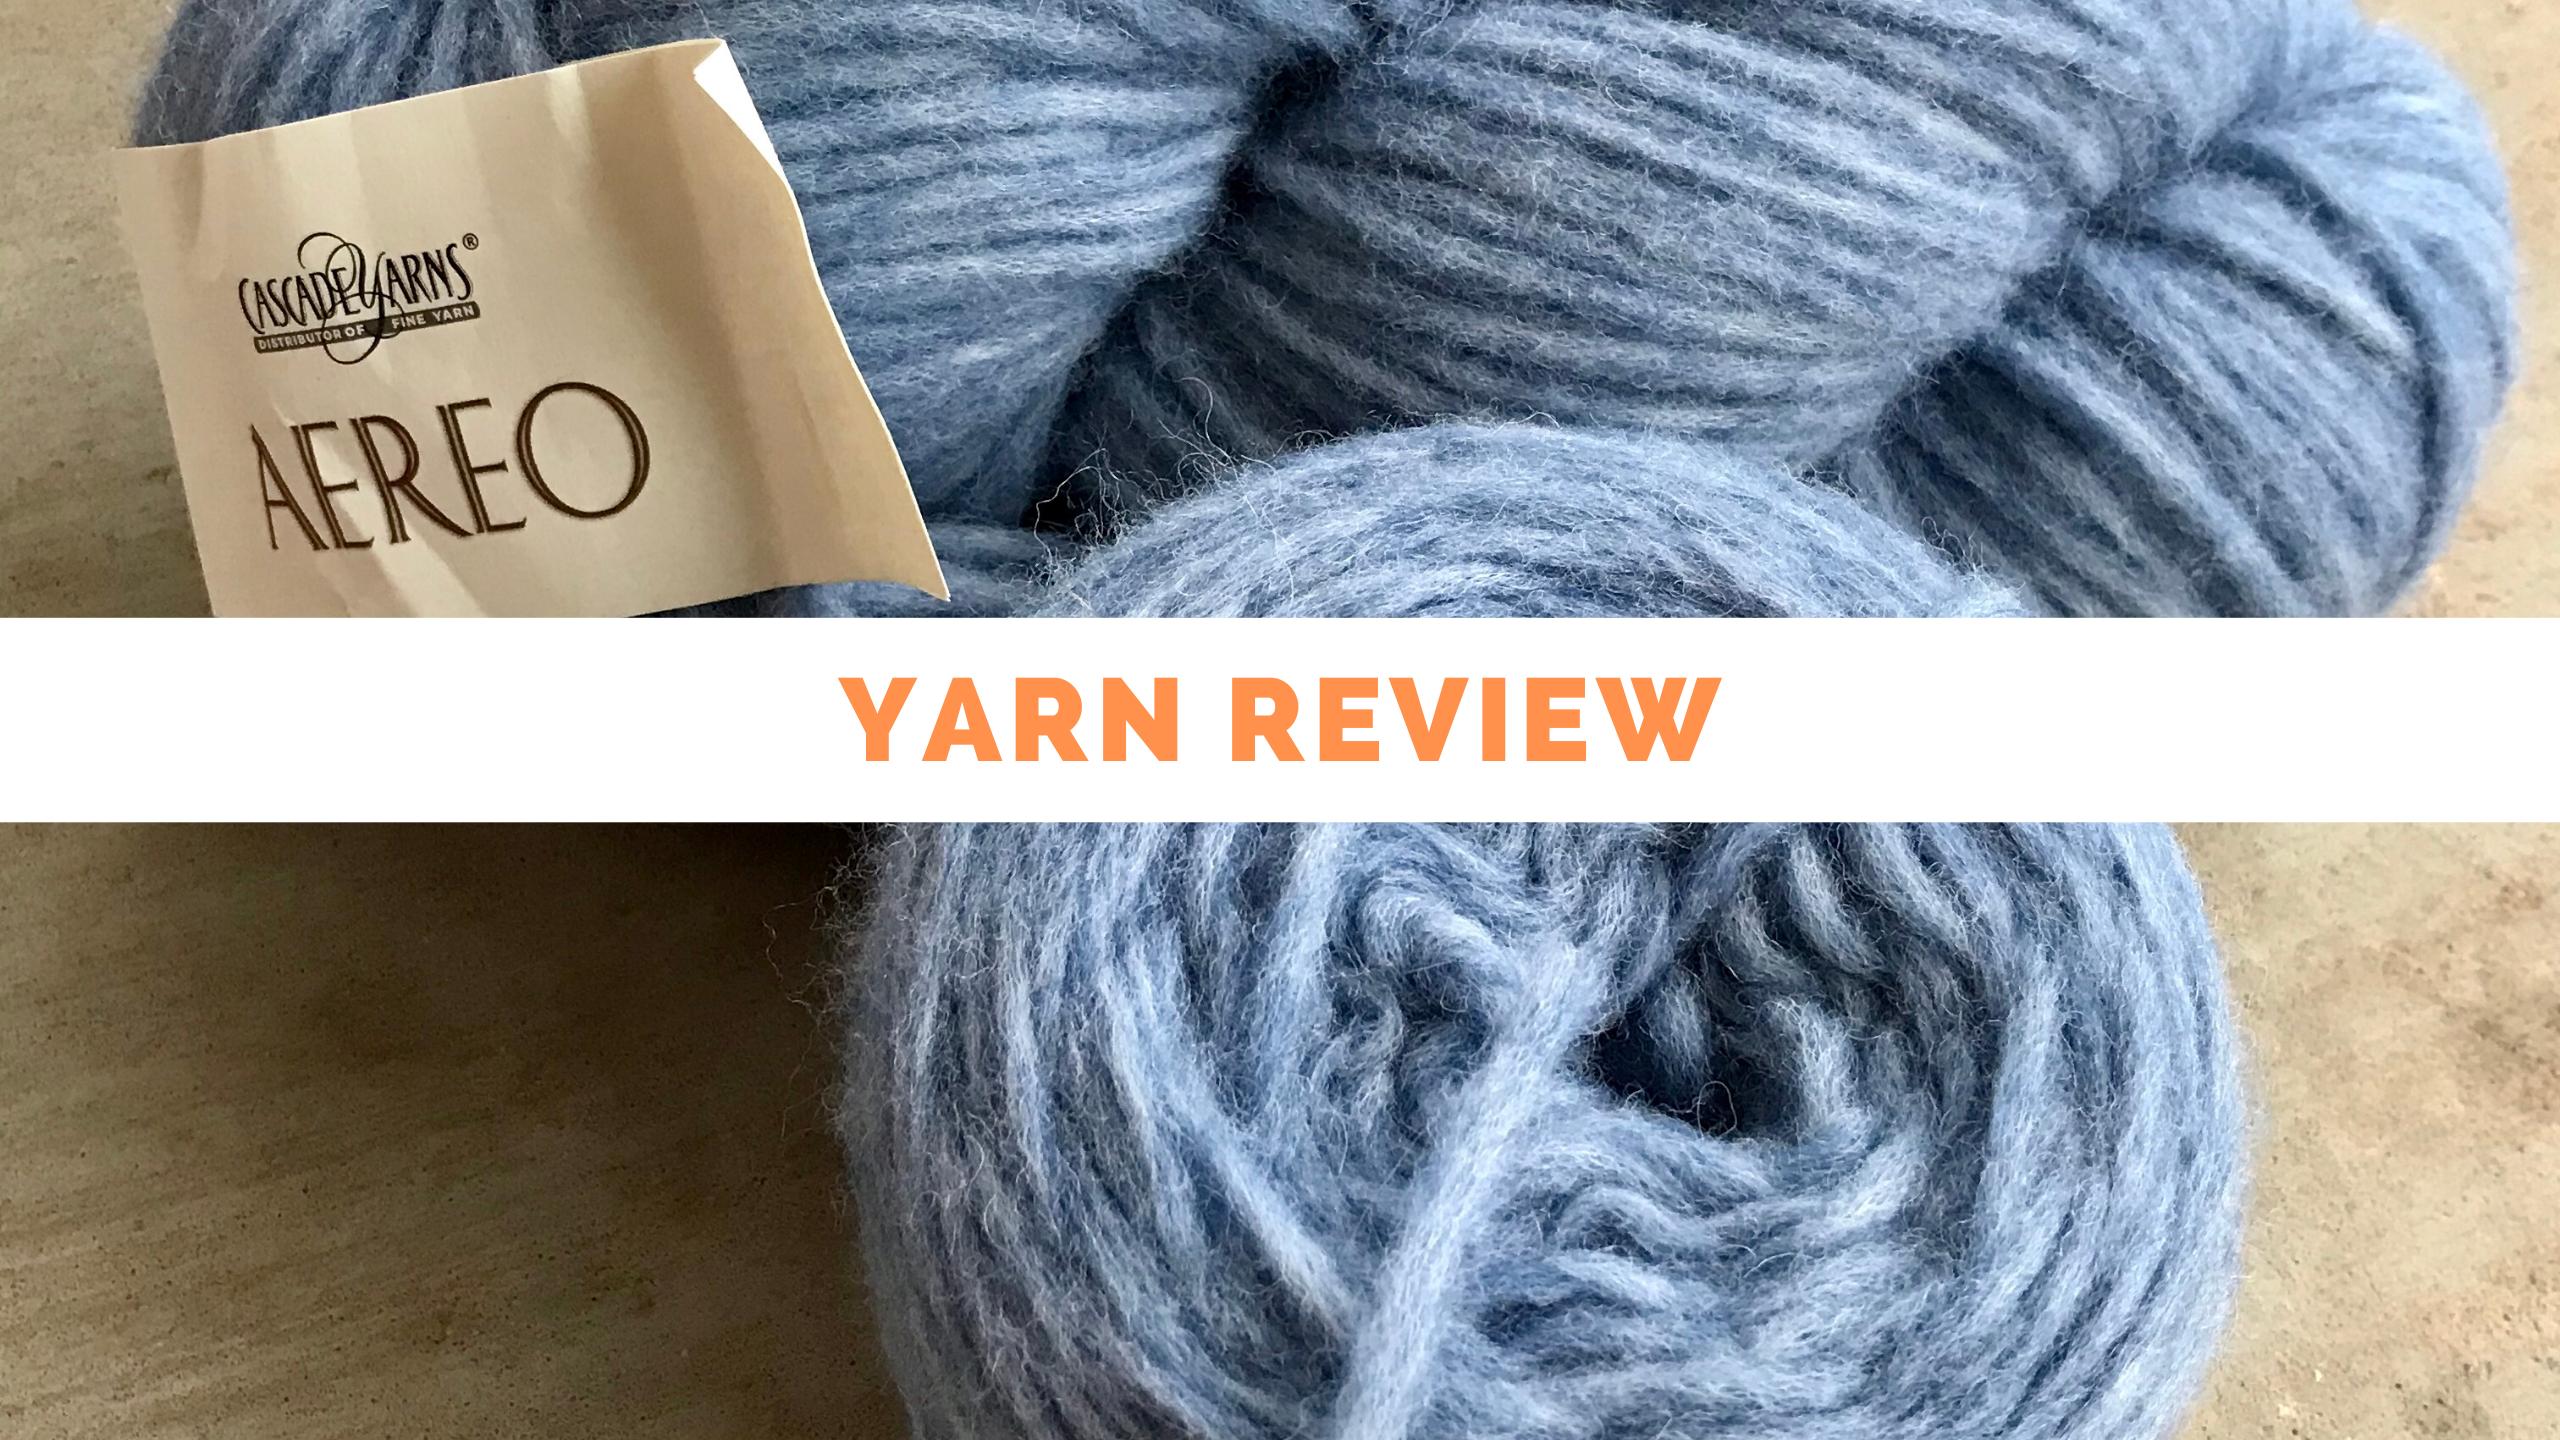 Yarn Review of Cascade Aereo. Review from Banana Moon Studio